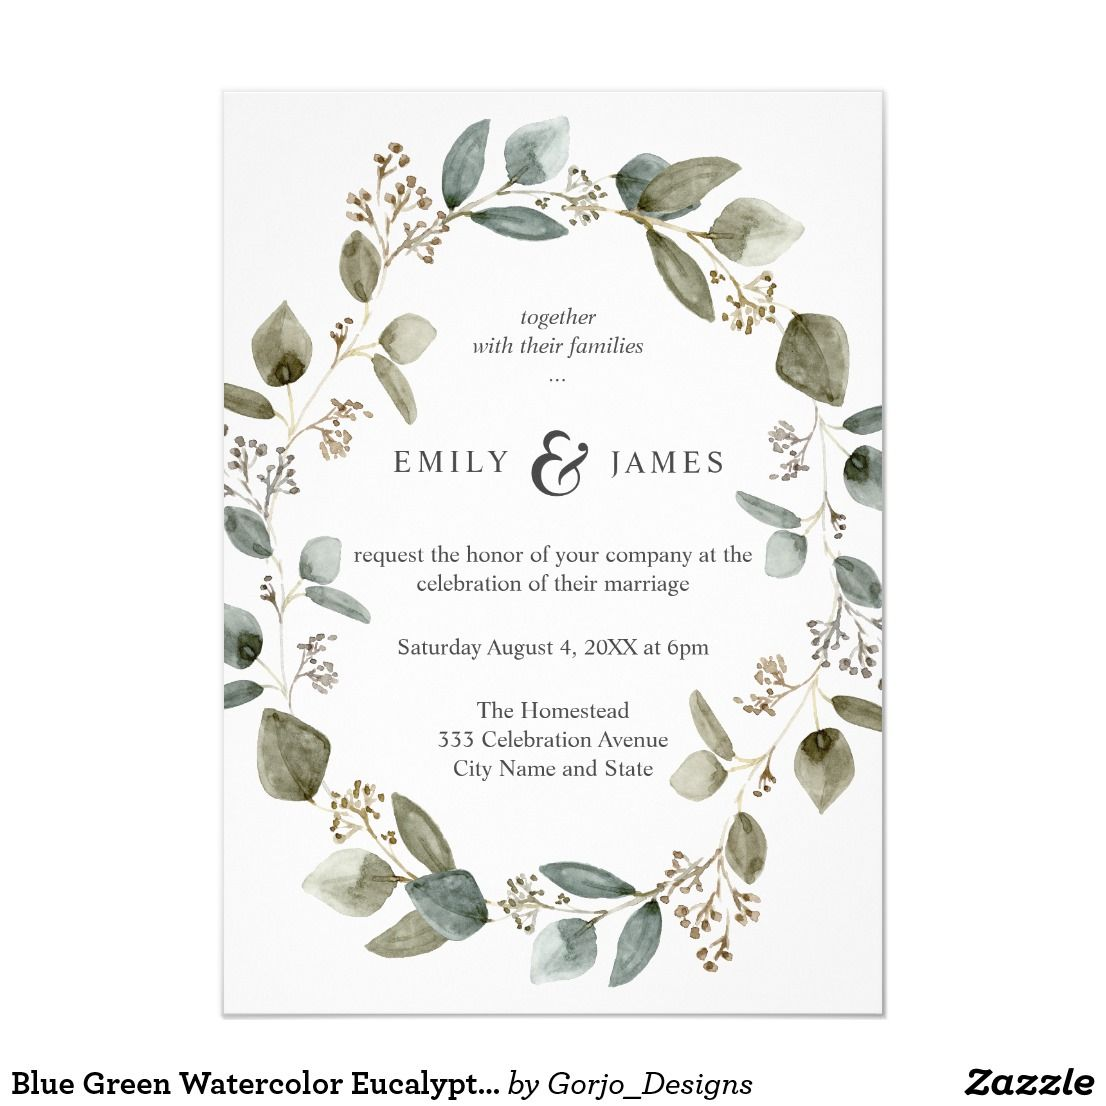 Blue green watercolor eucalyptus leaves wedding invitation